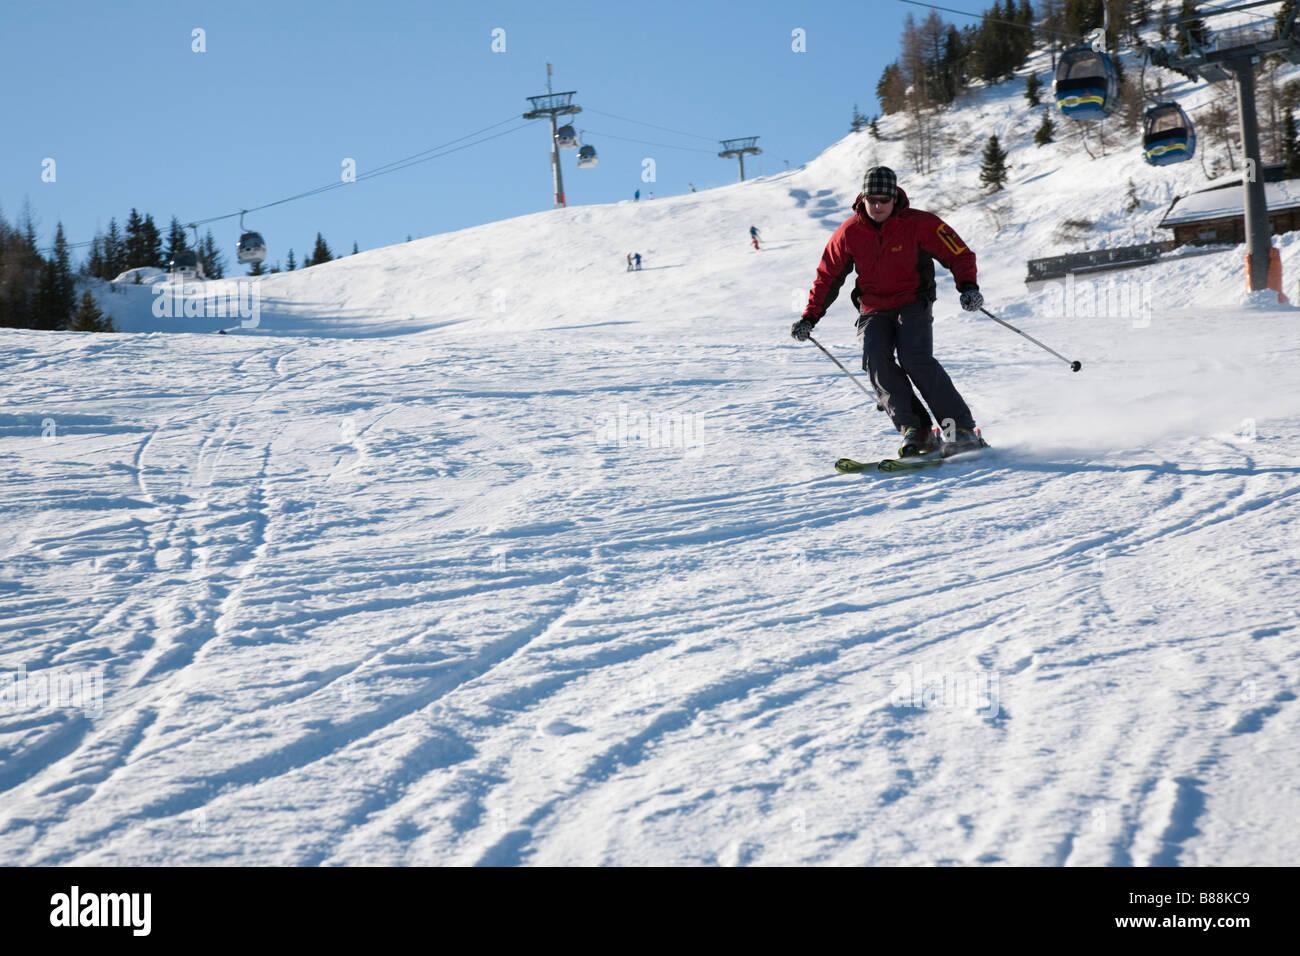 Rauris Austria Downhill skier skiing down Rauriser Hochalmbahnen ski slope piste in Austrian Alps in winter snow - Stock Image